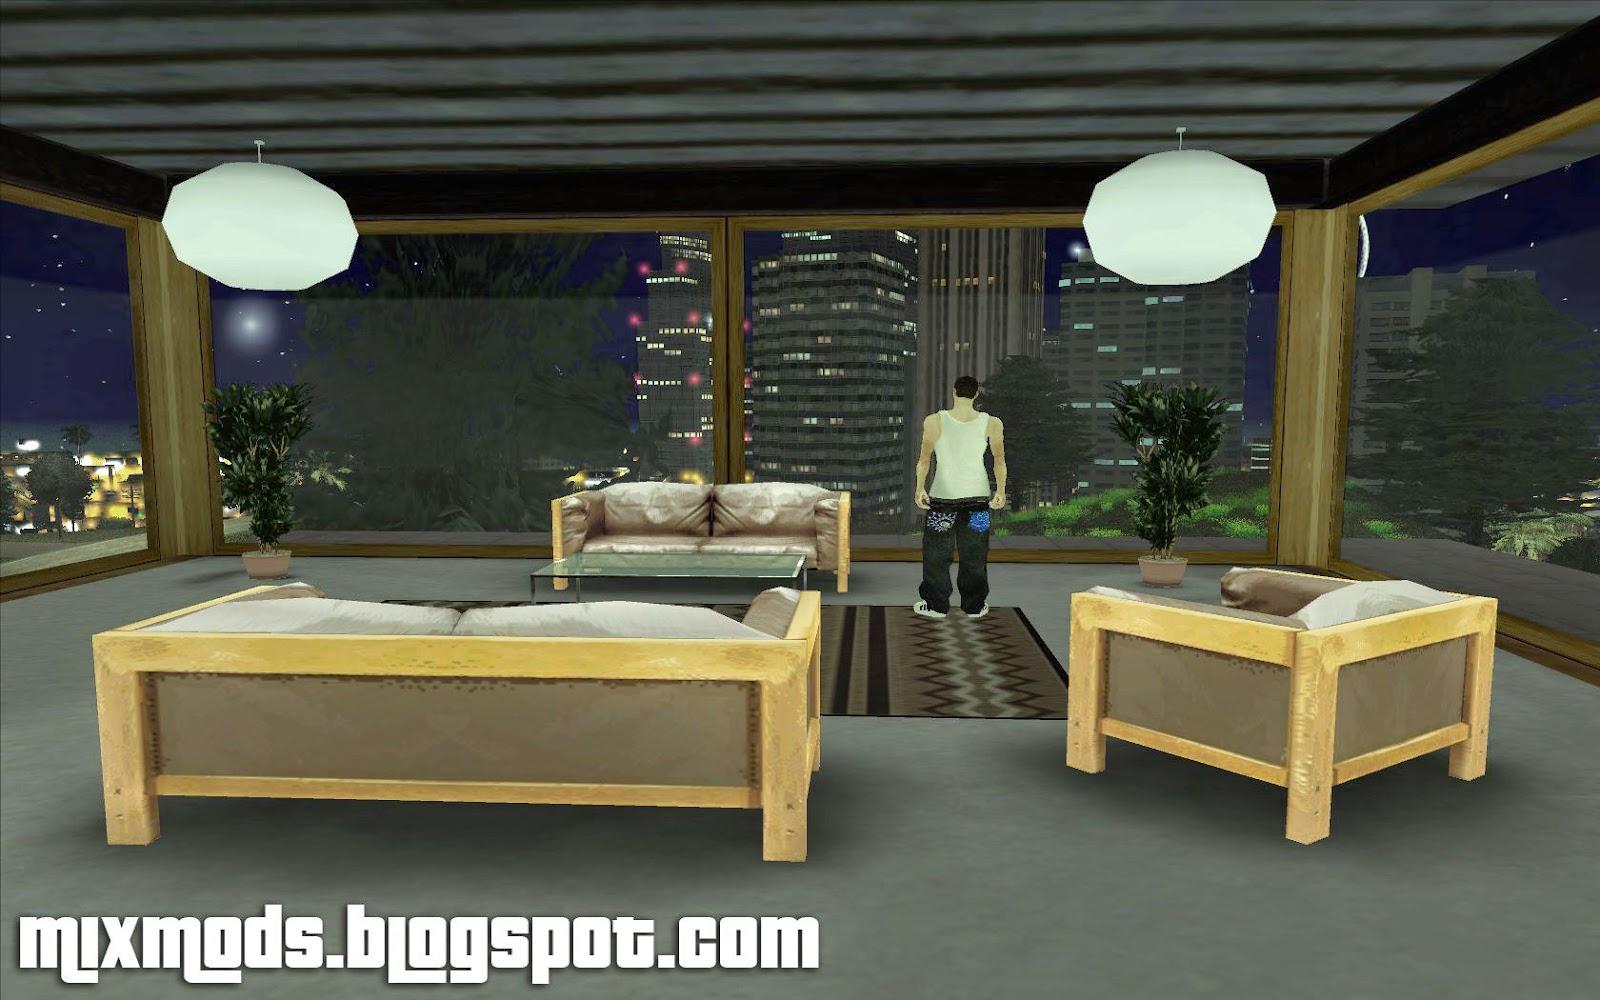 beta mulholland safehouse safe-house gta sa beta mod interior window